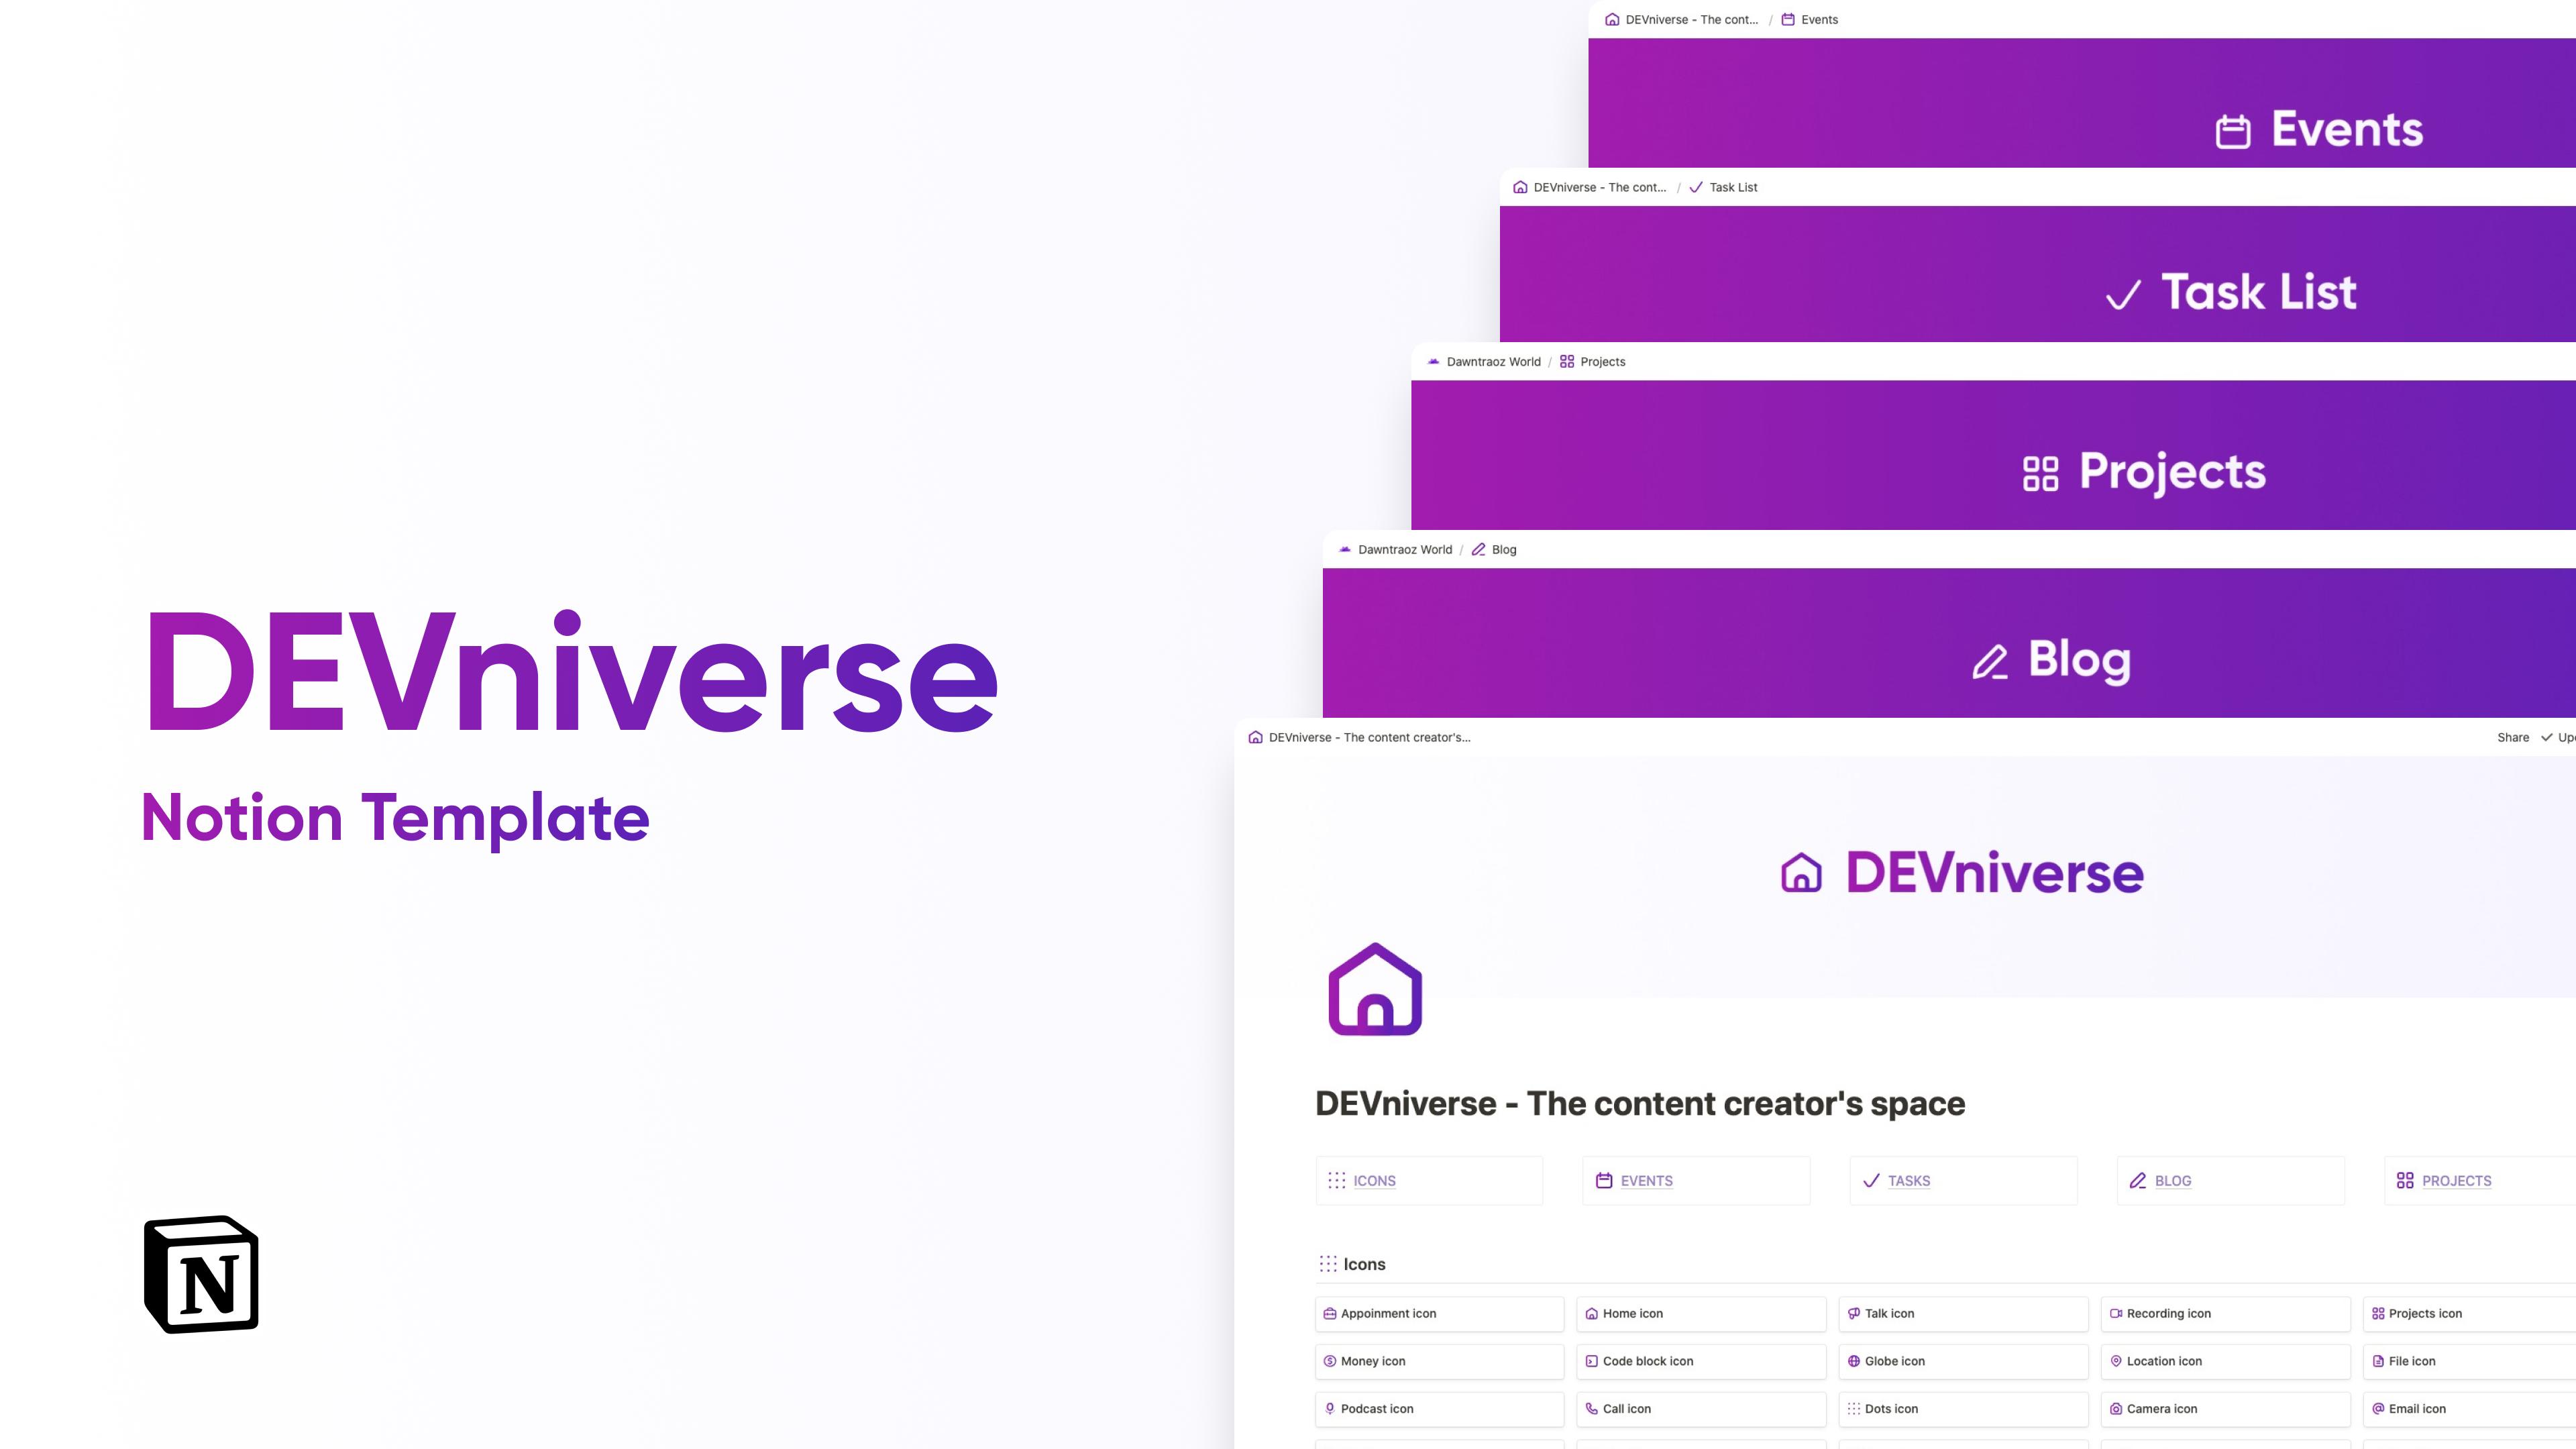 DEVniverse  -  The content creator's space